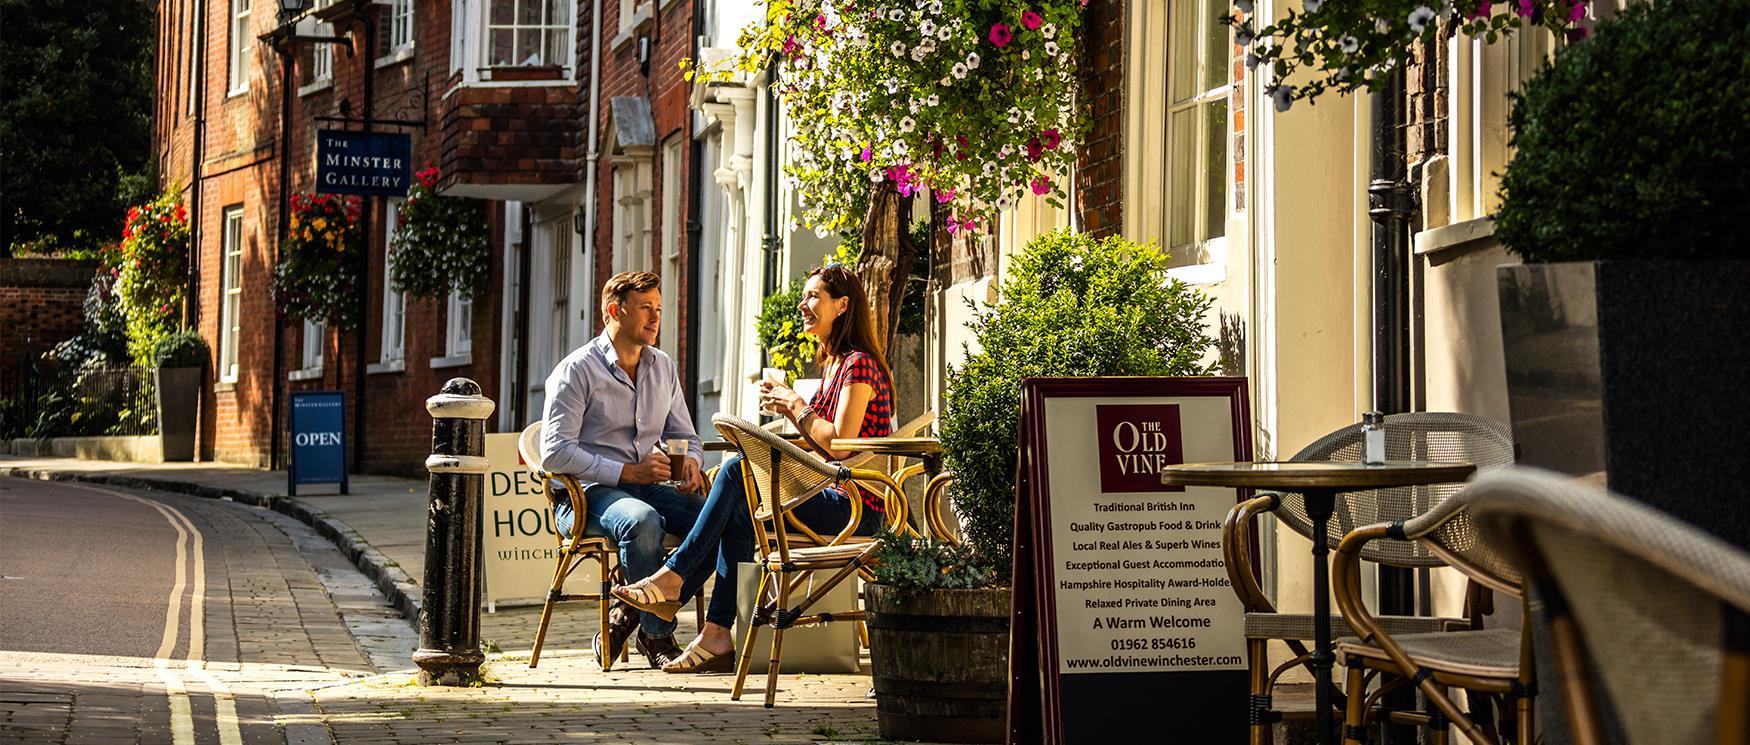 Romantic Breaks in Hampshire